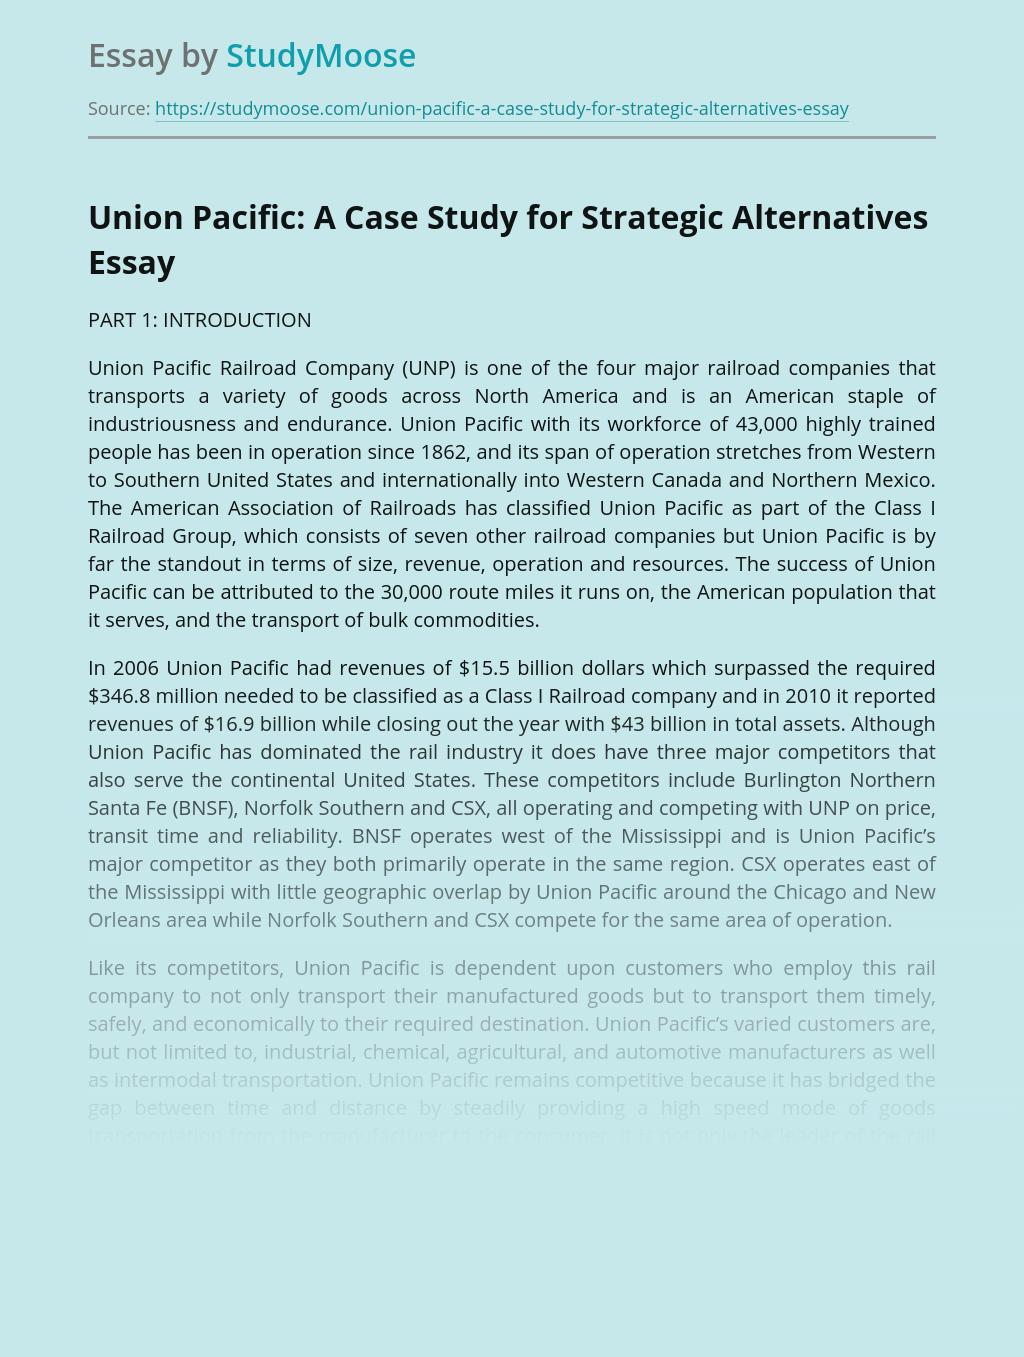 Union Pacific: A Case Study for Strategic Alternatives